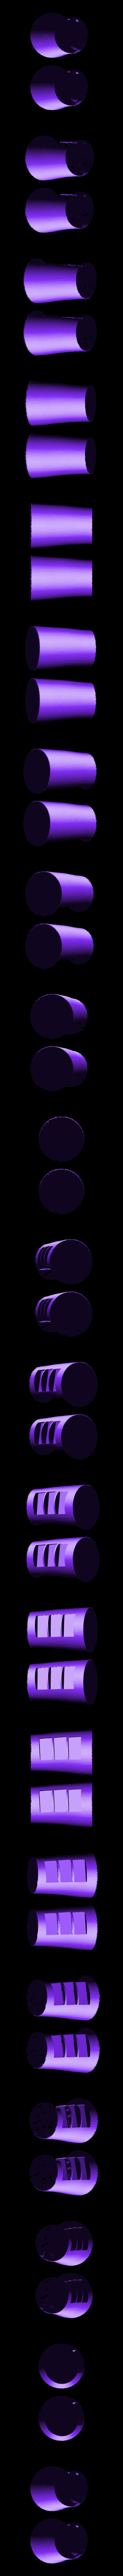 SG_Bracer_Red.stl Download free STL file Space Ghost • 3D printer model, mag-net